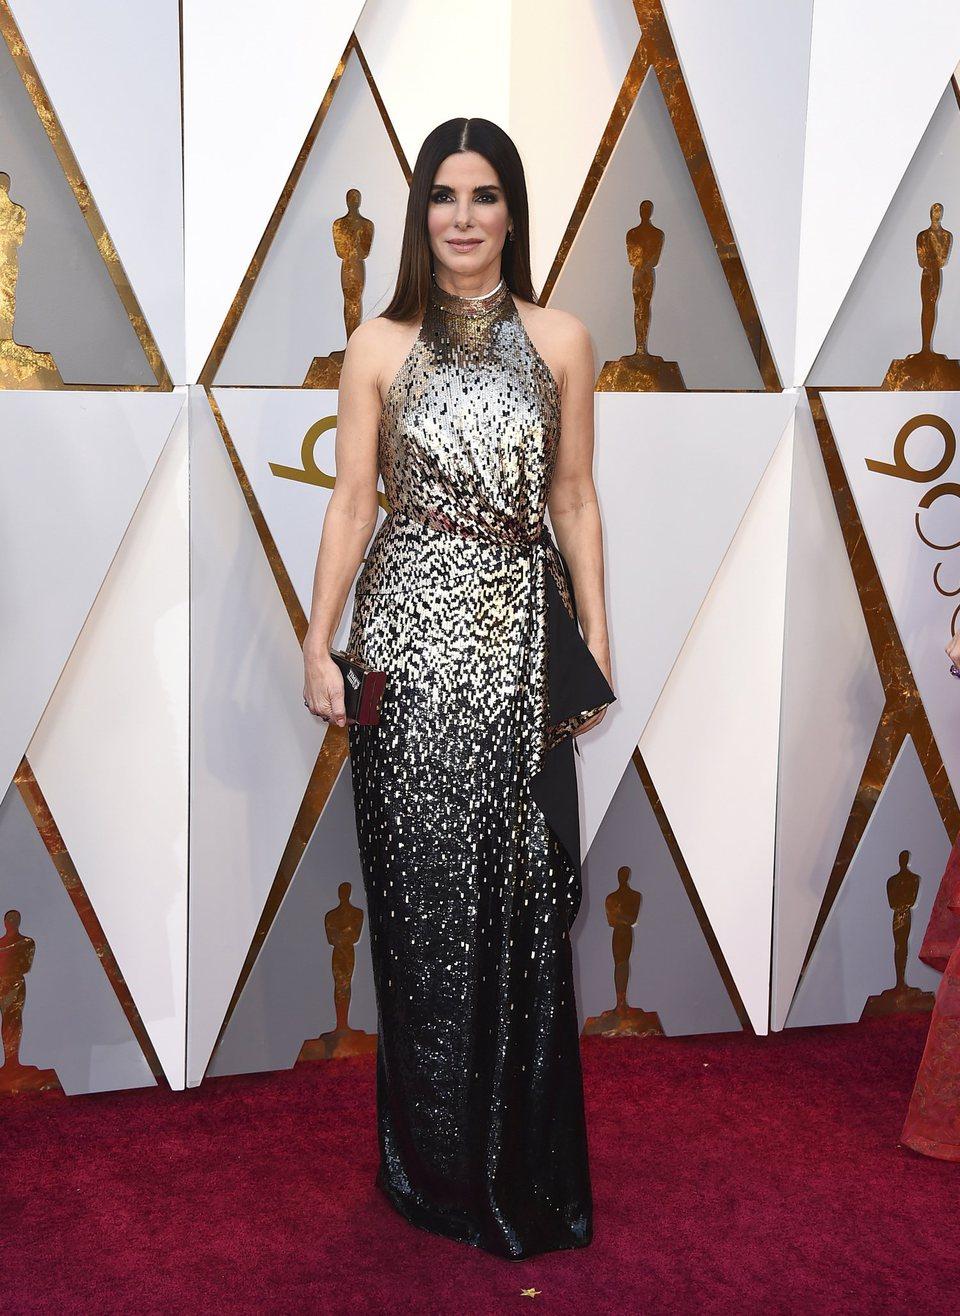 Sandra Bullock at the Oscar 2018 red carpet - Photos at